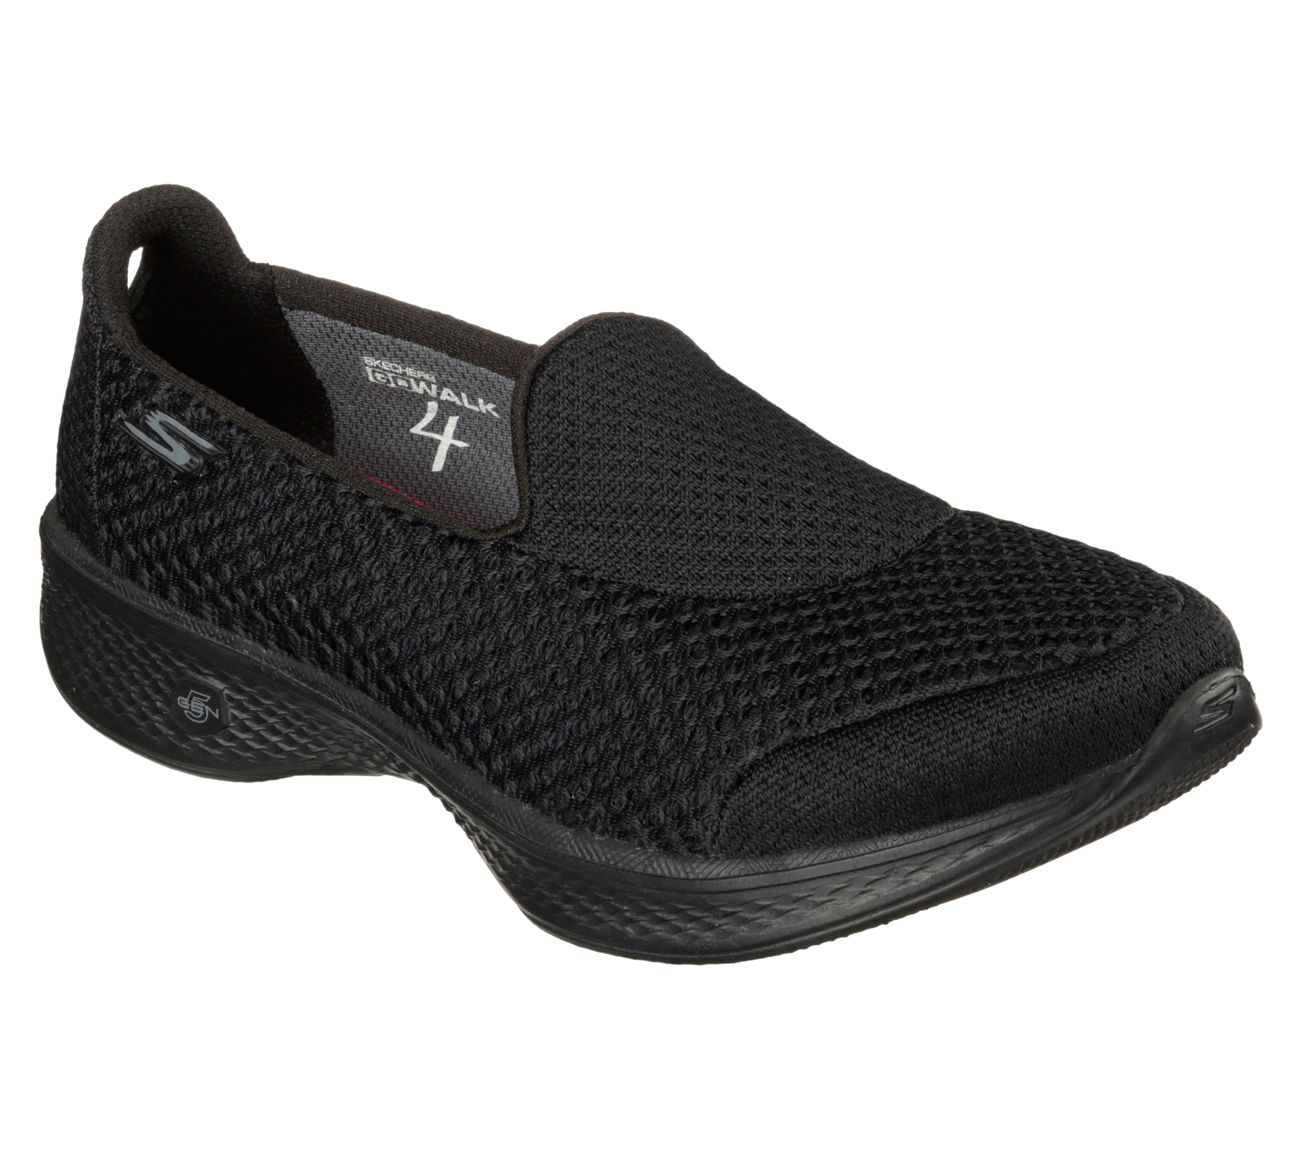 Skechers Go Walk Womens Shoes India